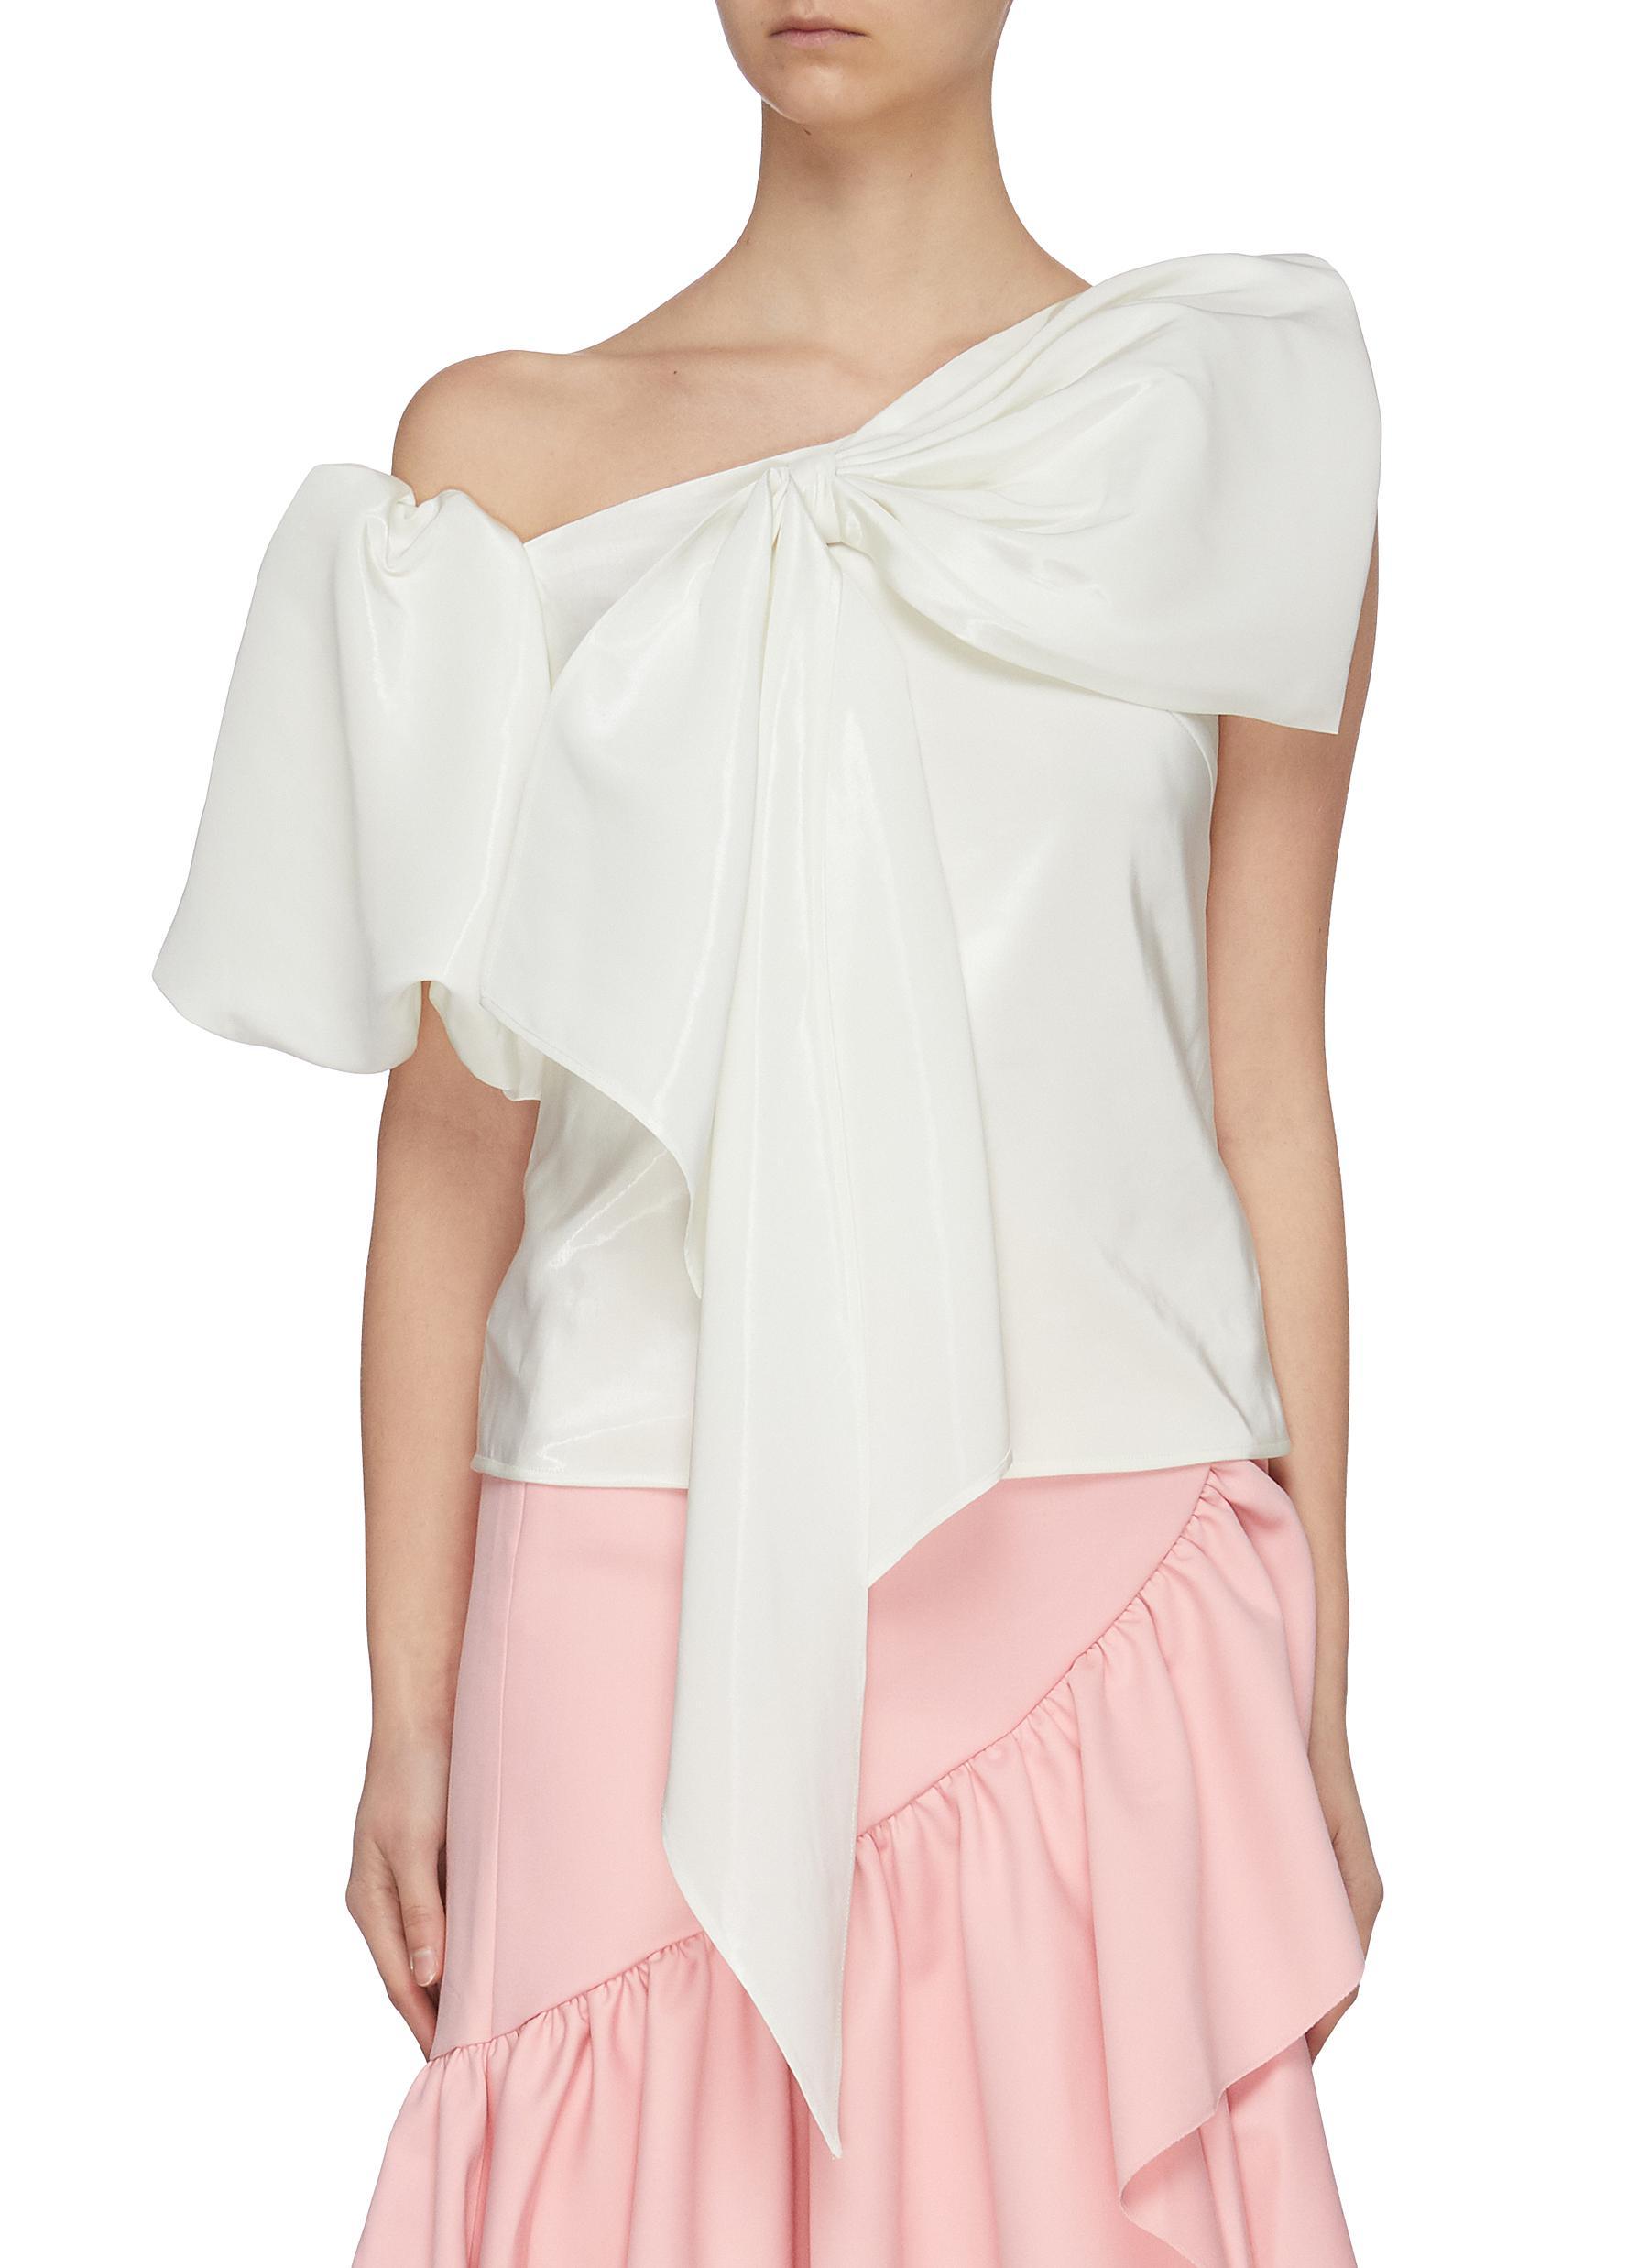 Buy Ming Ma Tops Asymmetric puff sleeve bow top